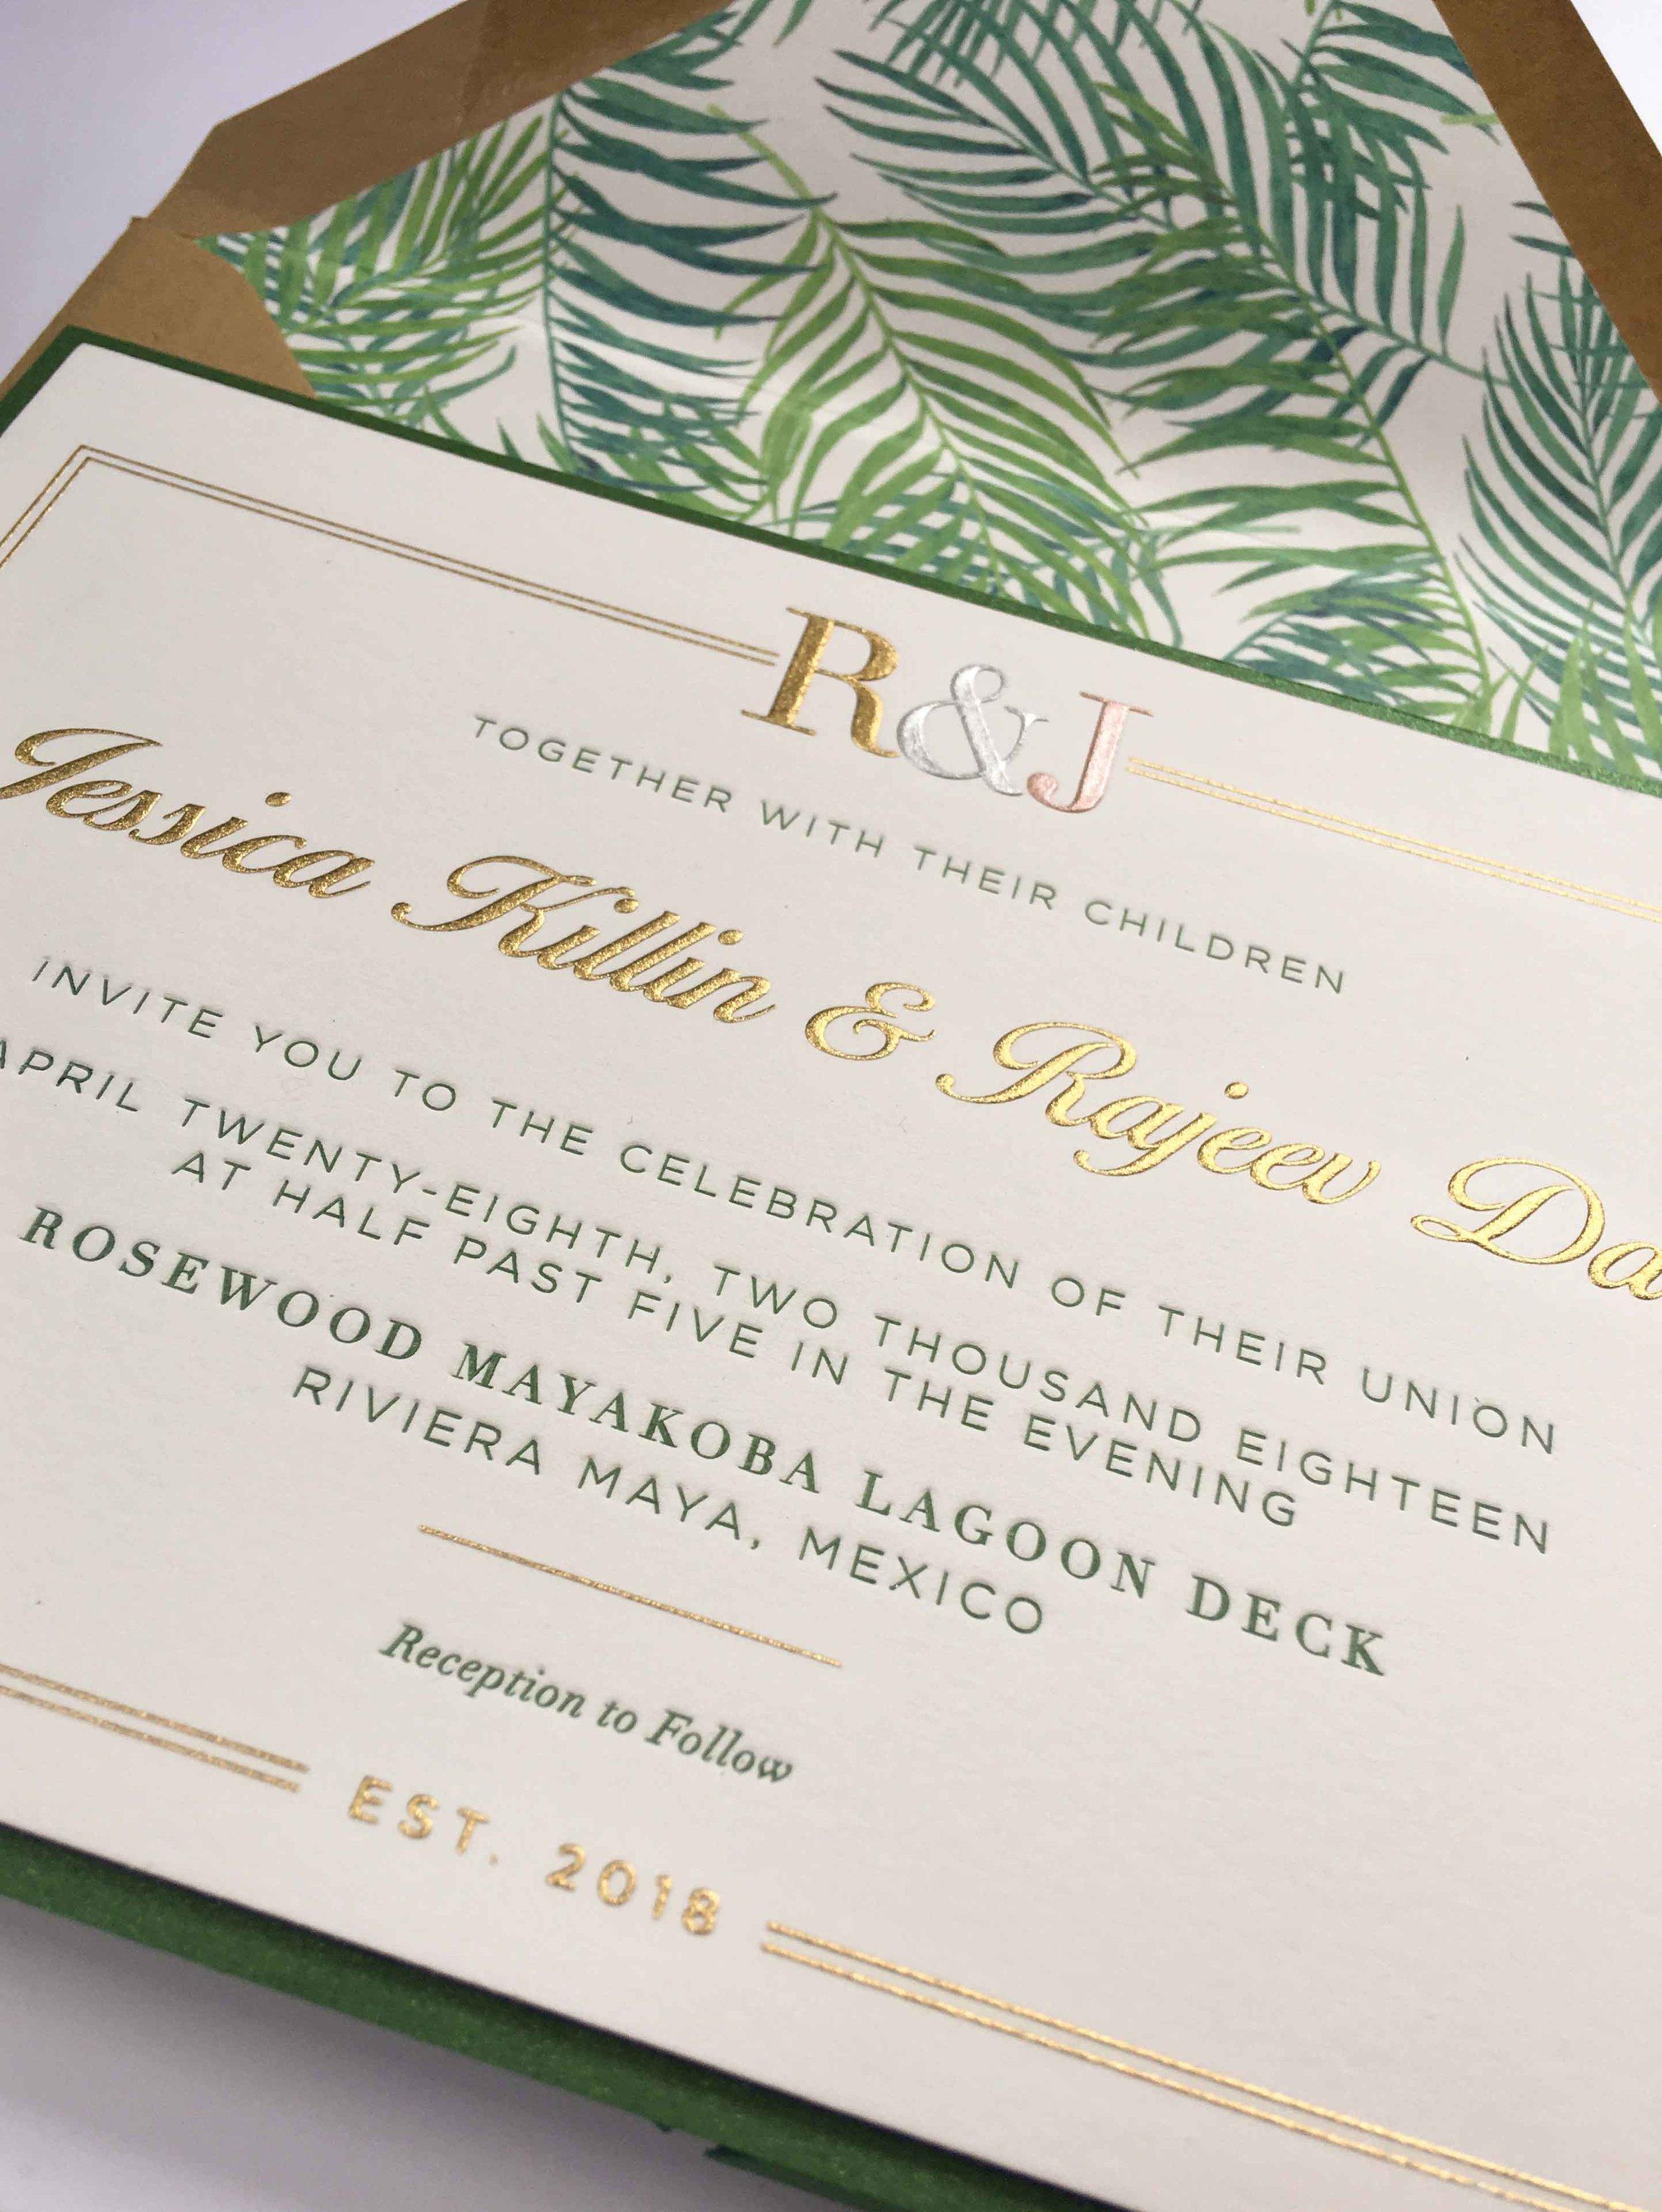 Type-A-Invitations-Letterpress-Engraved-Custom-Wedding-Invite-Jessica-Luxury-Resort-02-WEB.jpg